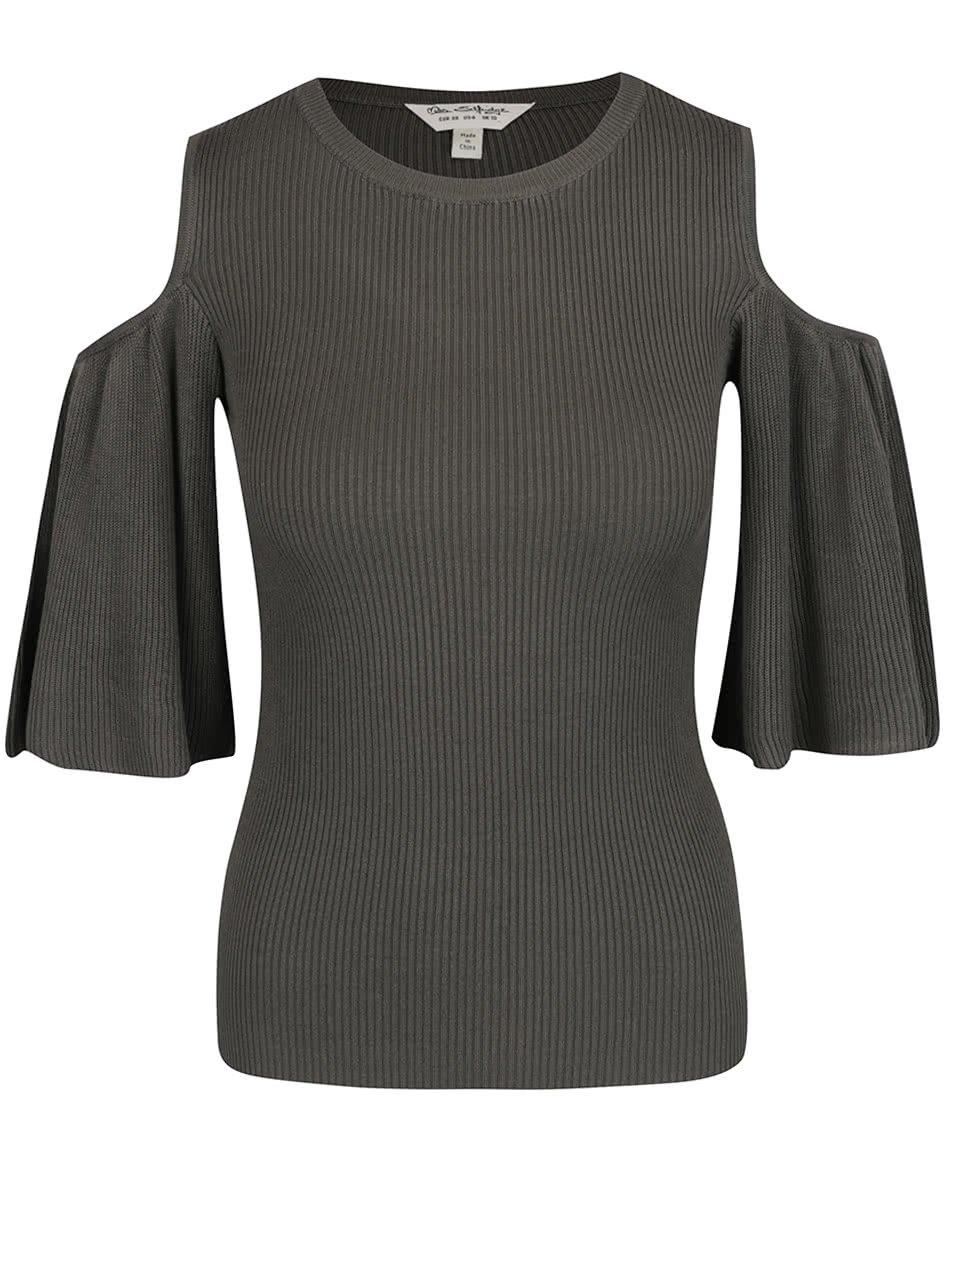 Khaki tričko s průstřihy na ramenou Miss Selfridge